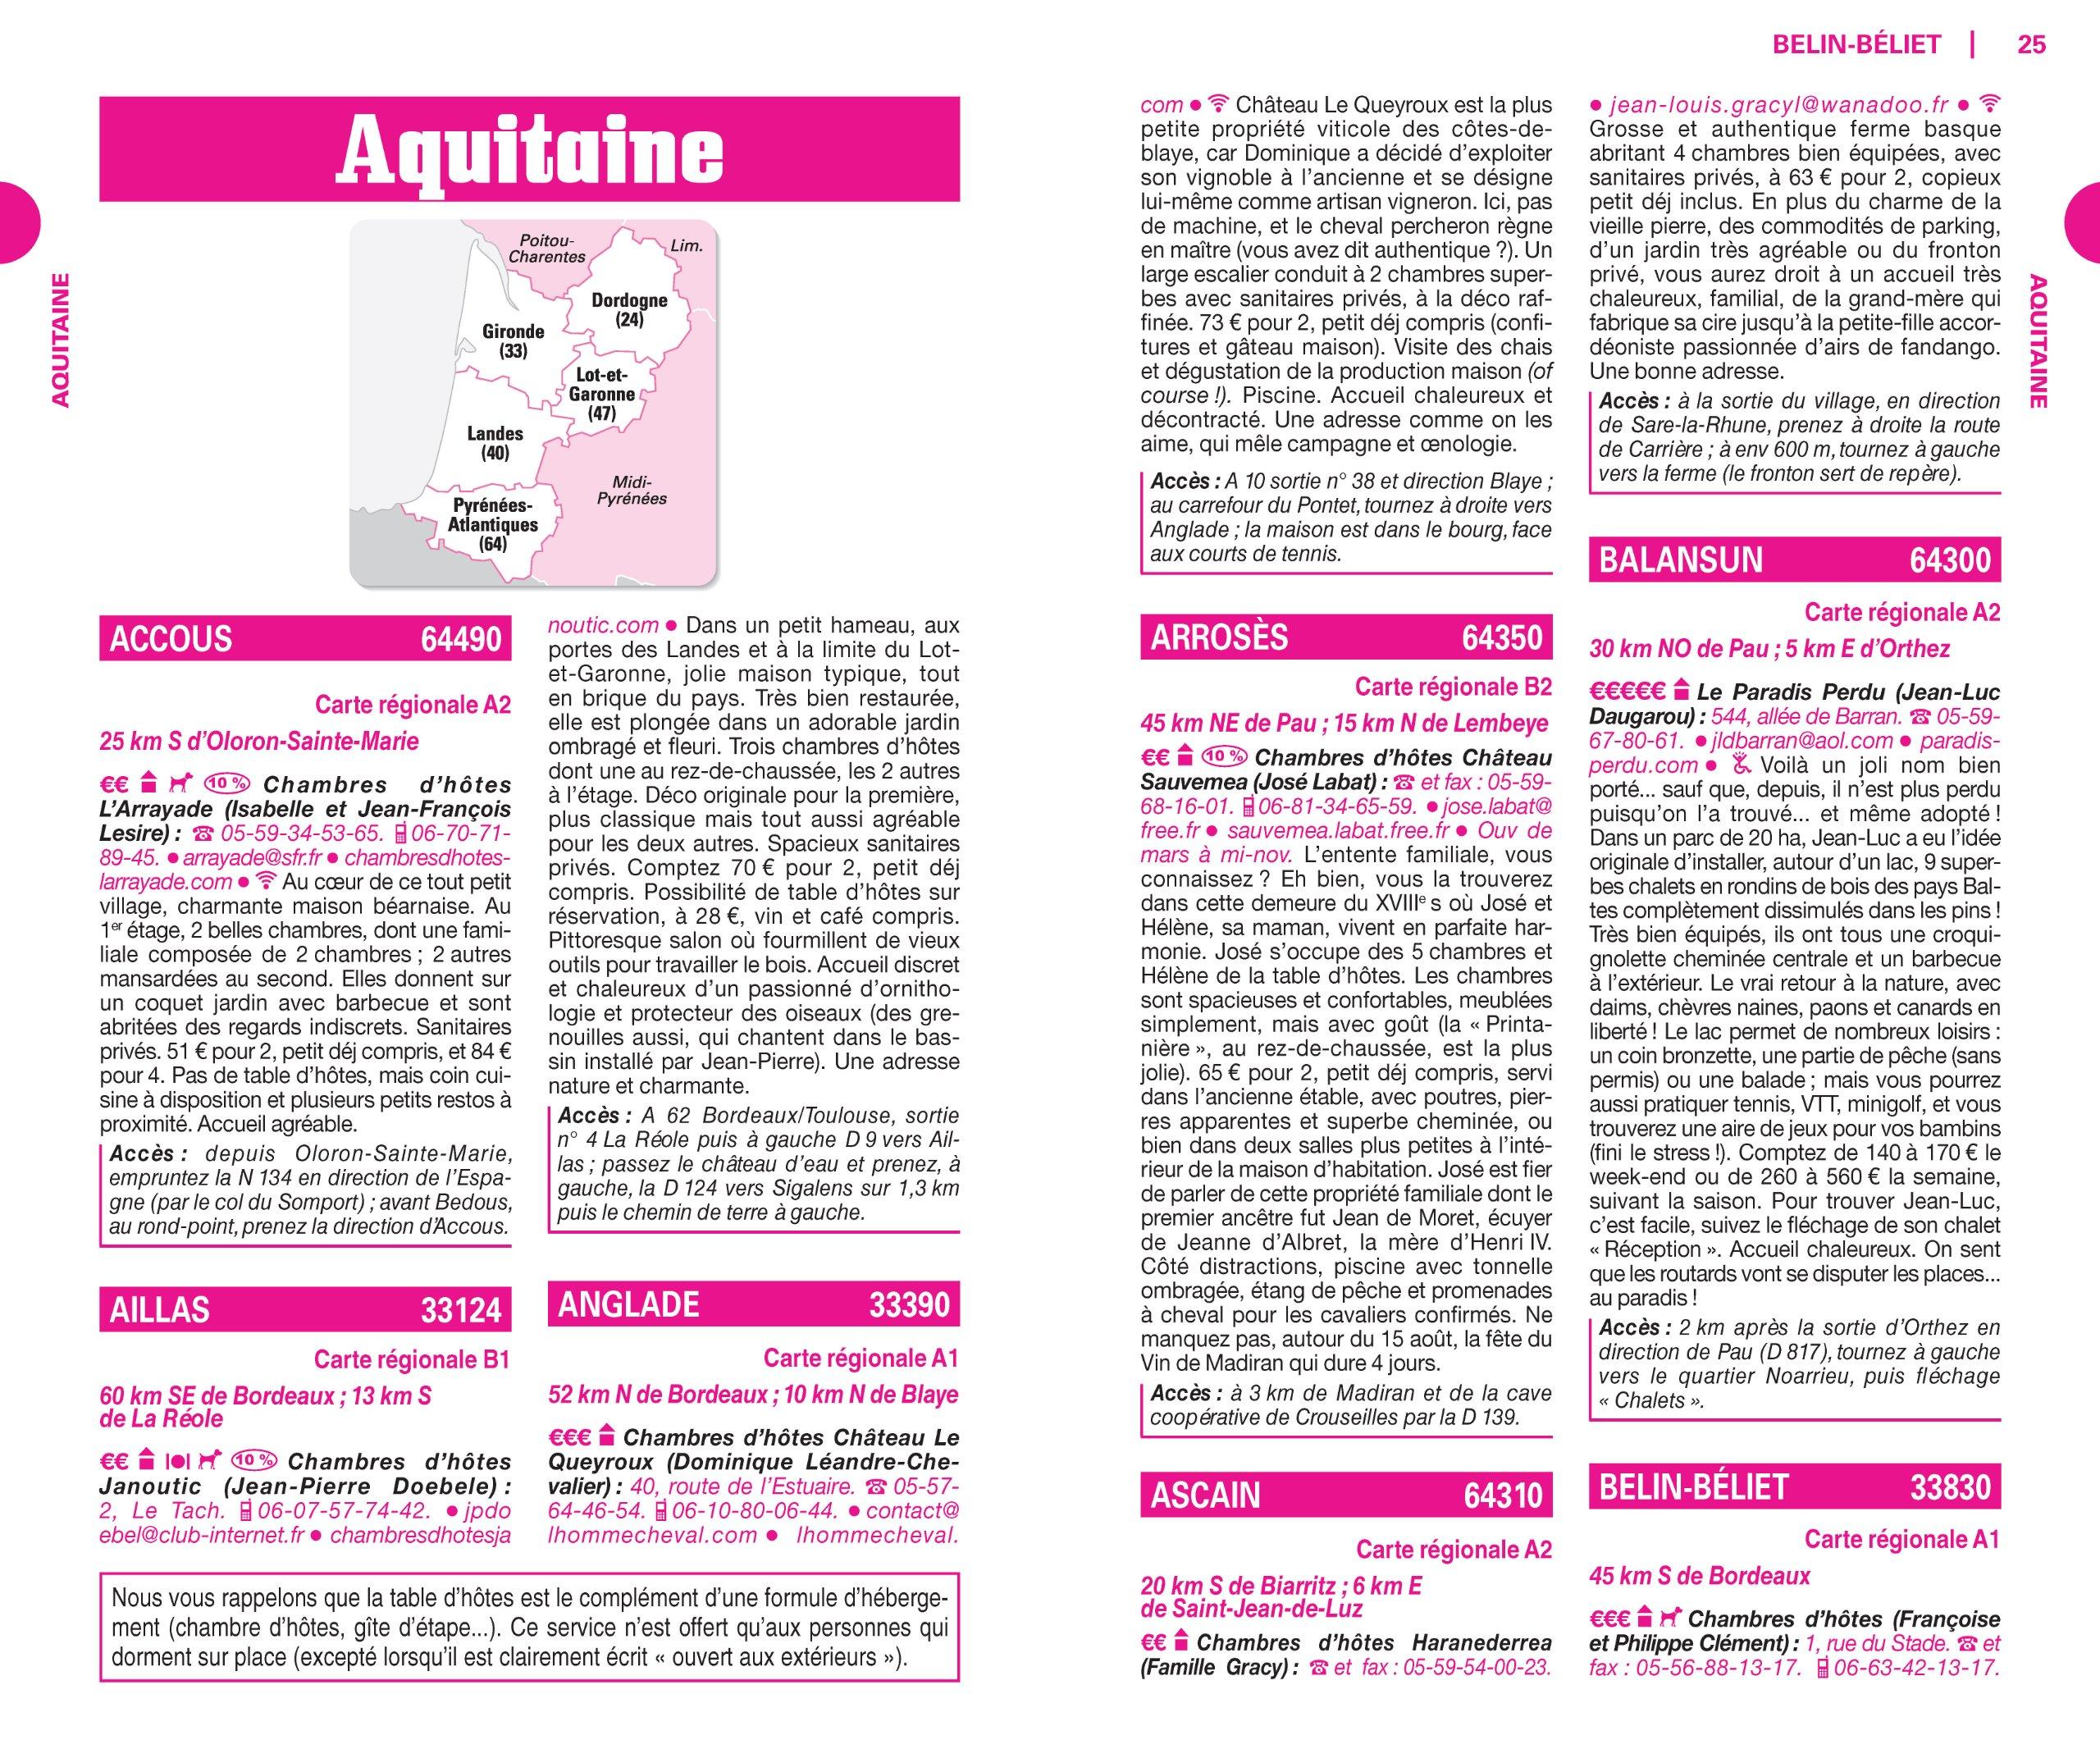 Buy Guide Du Routard France Nos Meilleures Chambres D hotes En